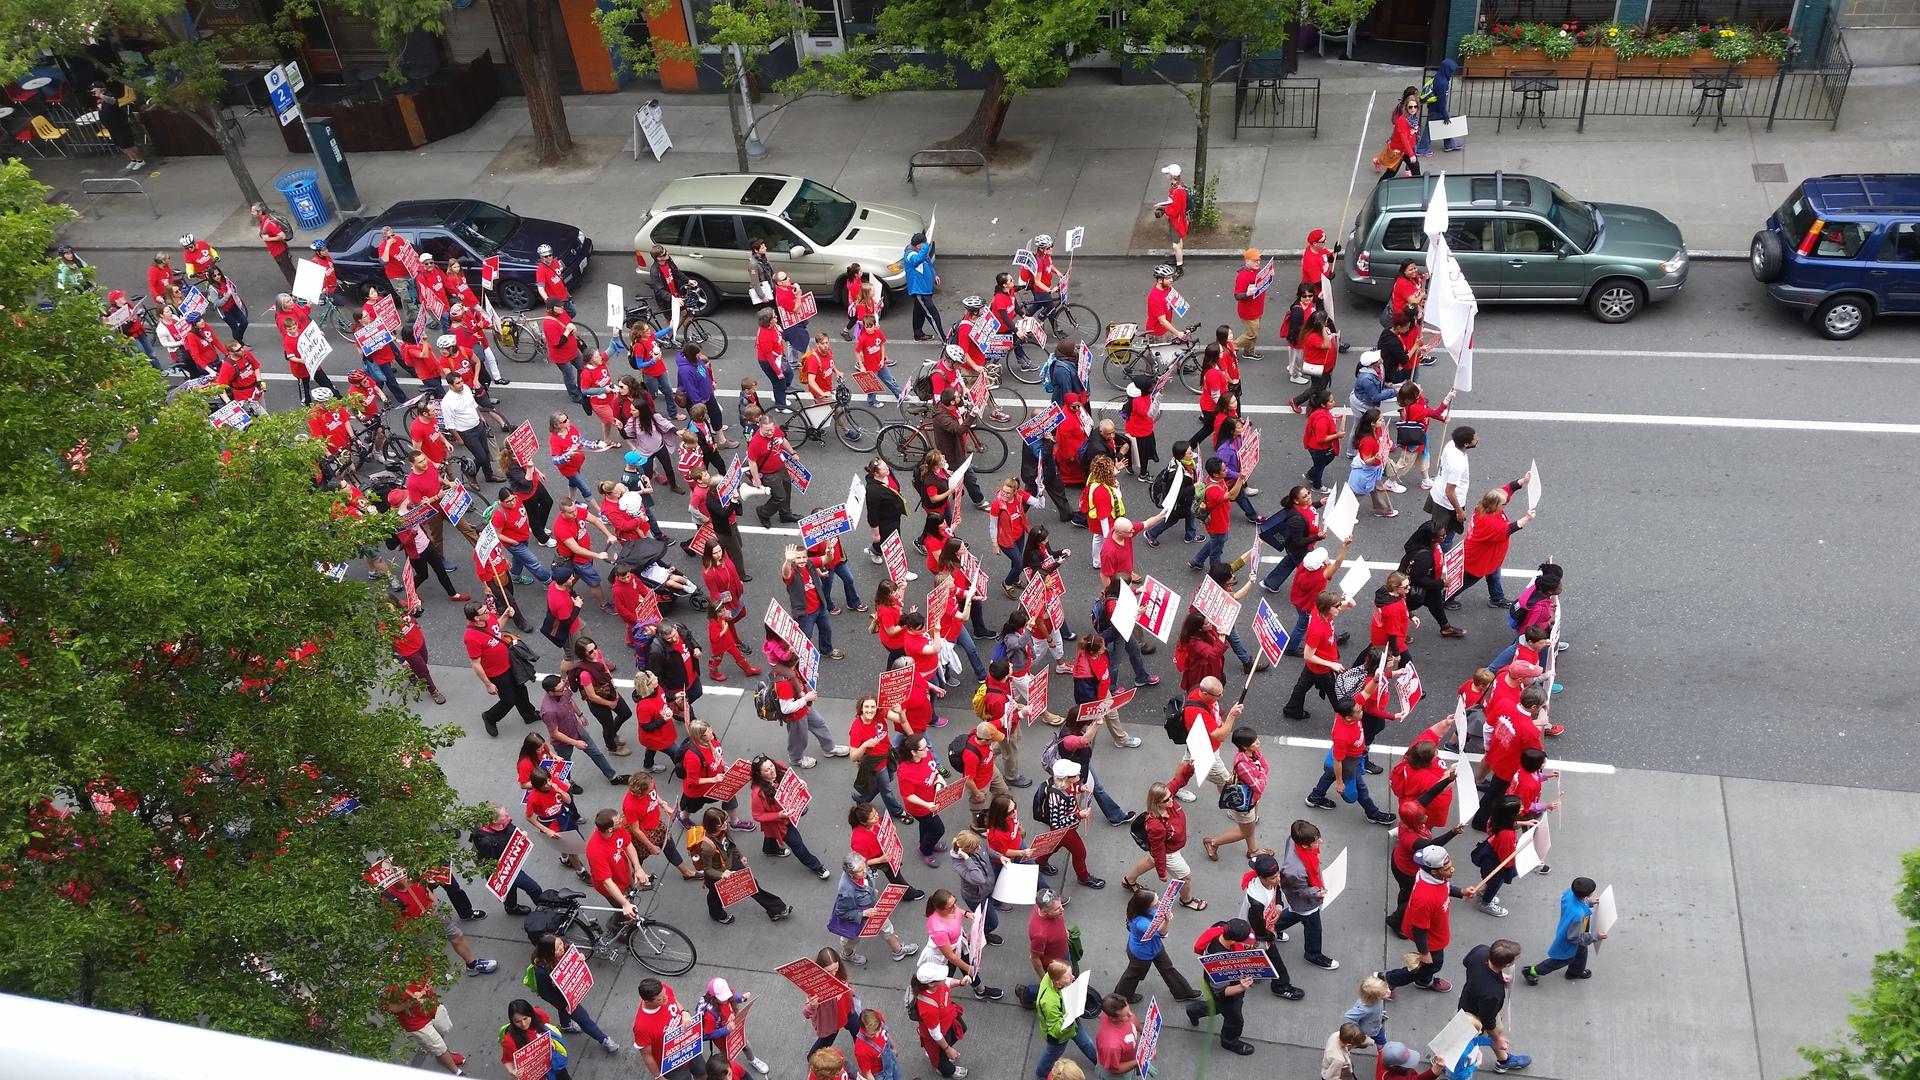 Teacher Education Protest in Seattle. Mat 2015